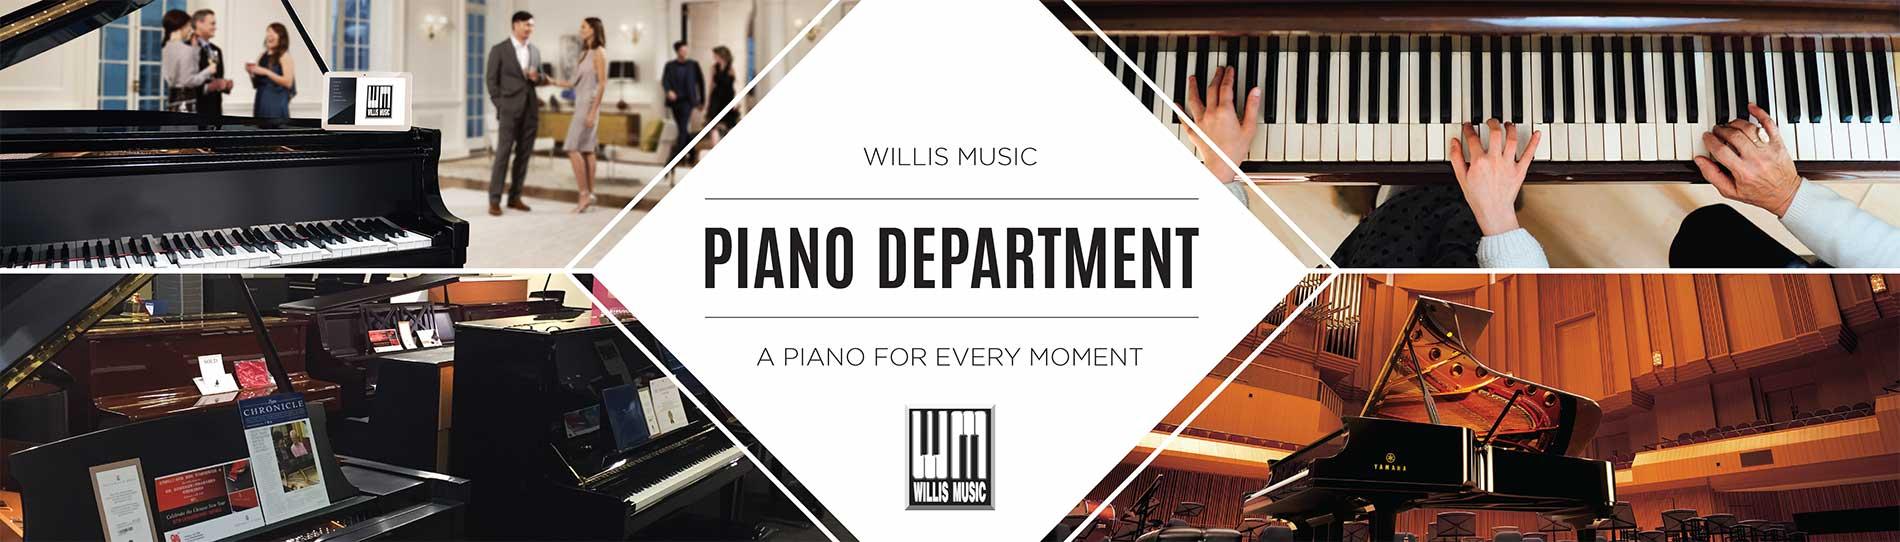 Piano Department Banner